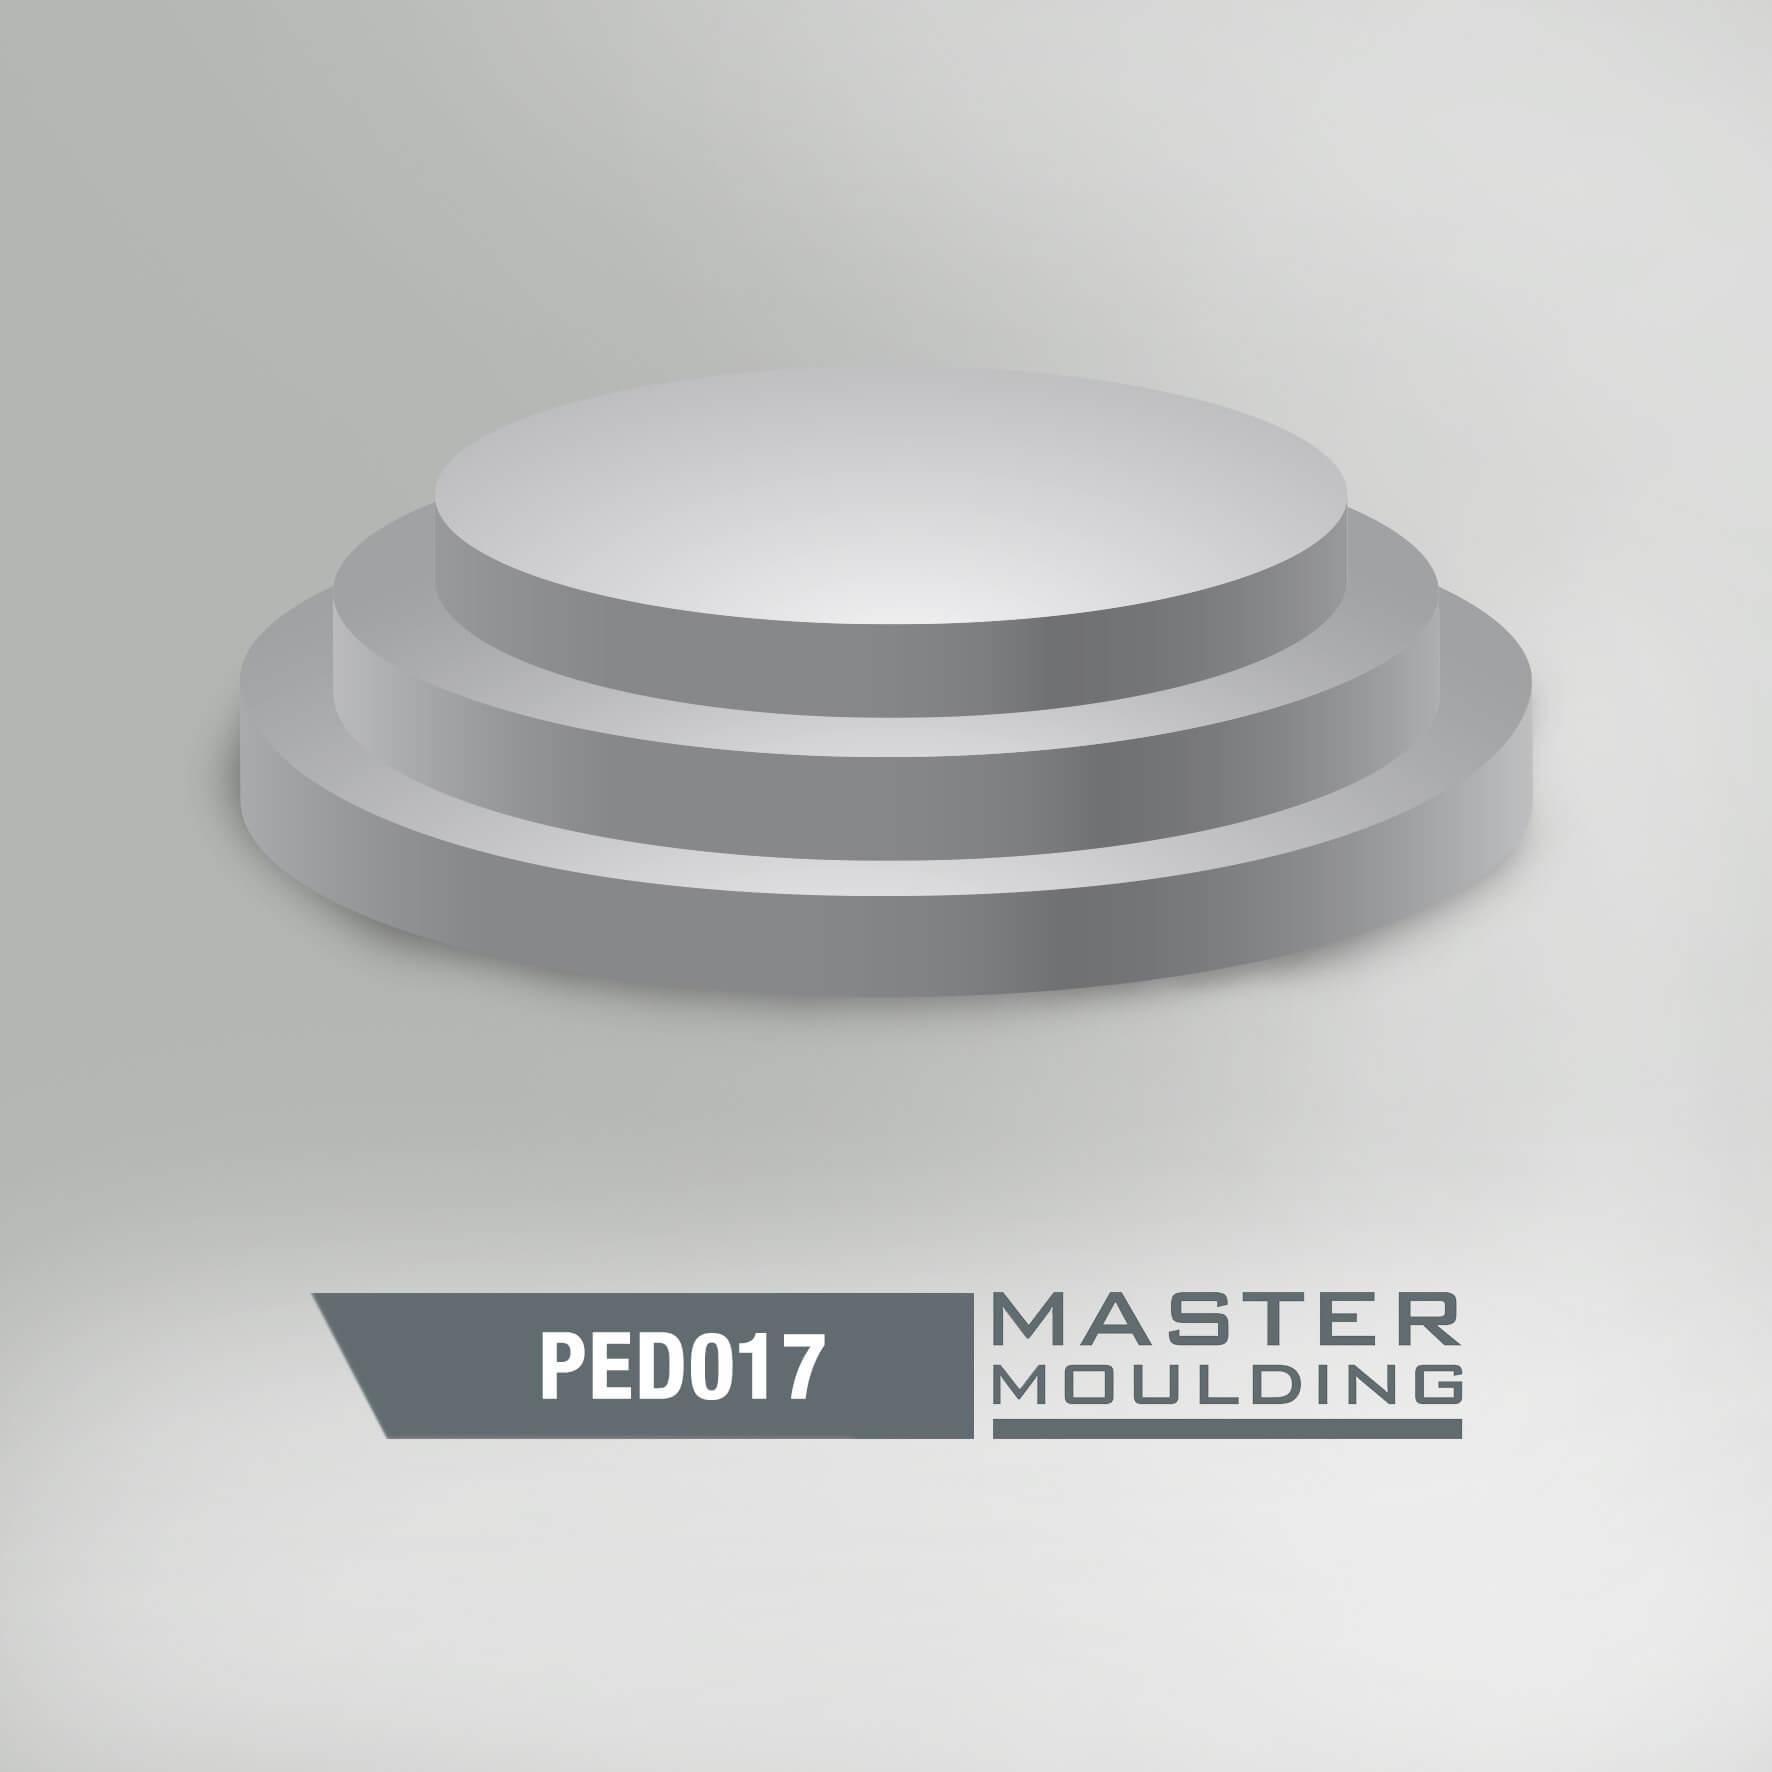 PED017